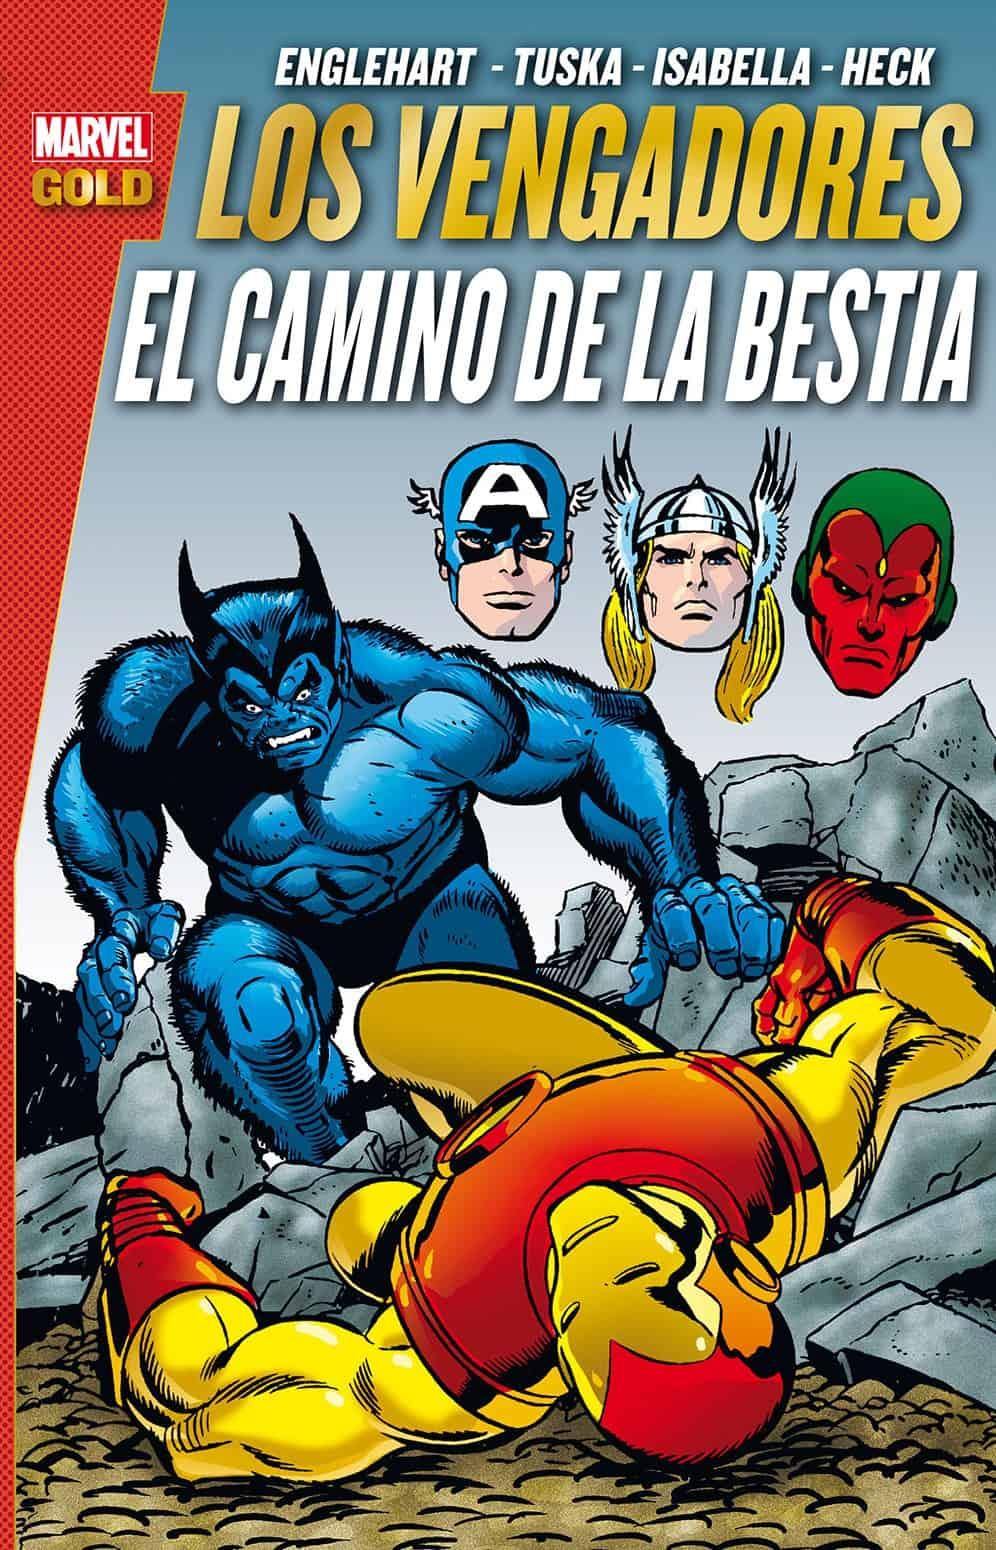 LOS VENGADORES.EL CAMINO DE LA BESTIA (MARVEL GOLD)